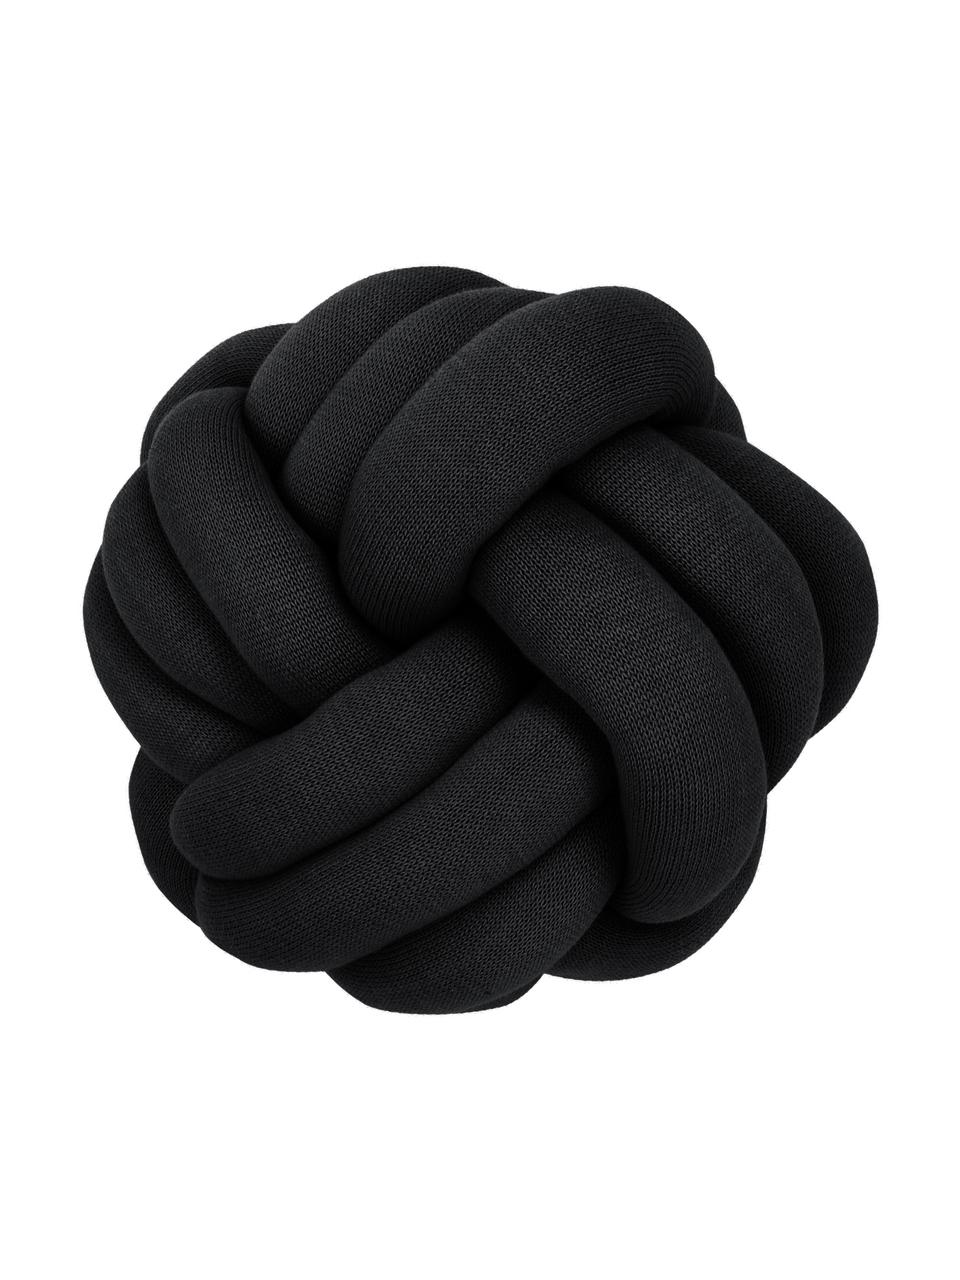 Cuscino nero Twist, Nero, Ø 30 cm